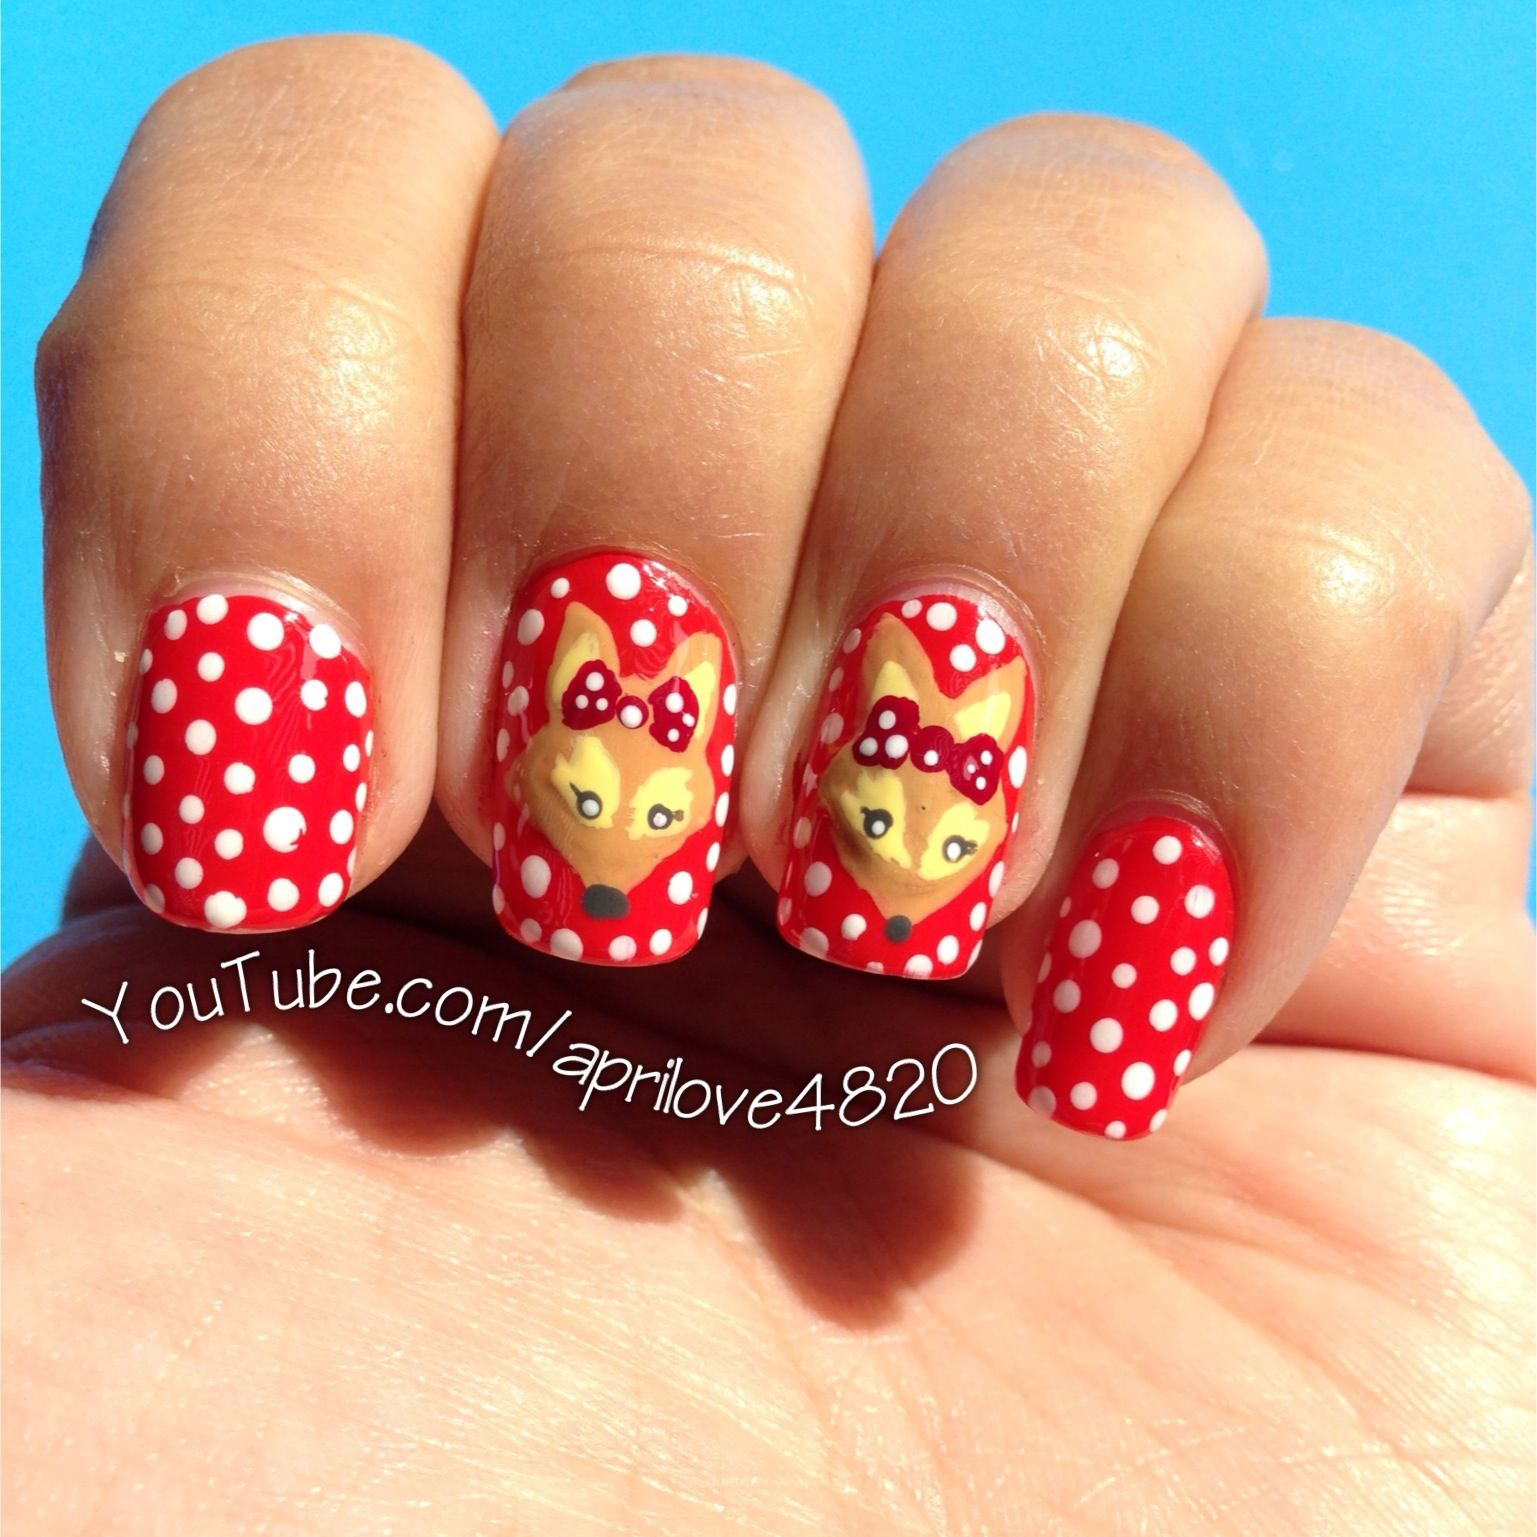 Fox nails nails for fall 2013 fall nails 2013 nails fox nails